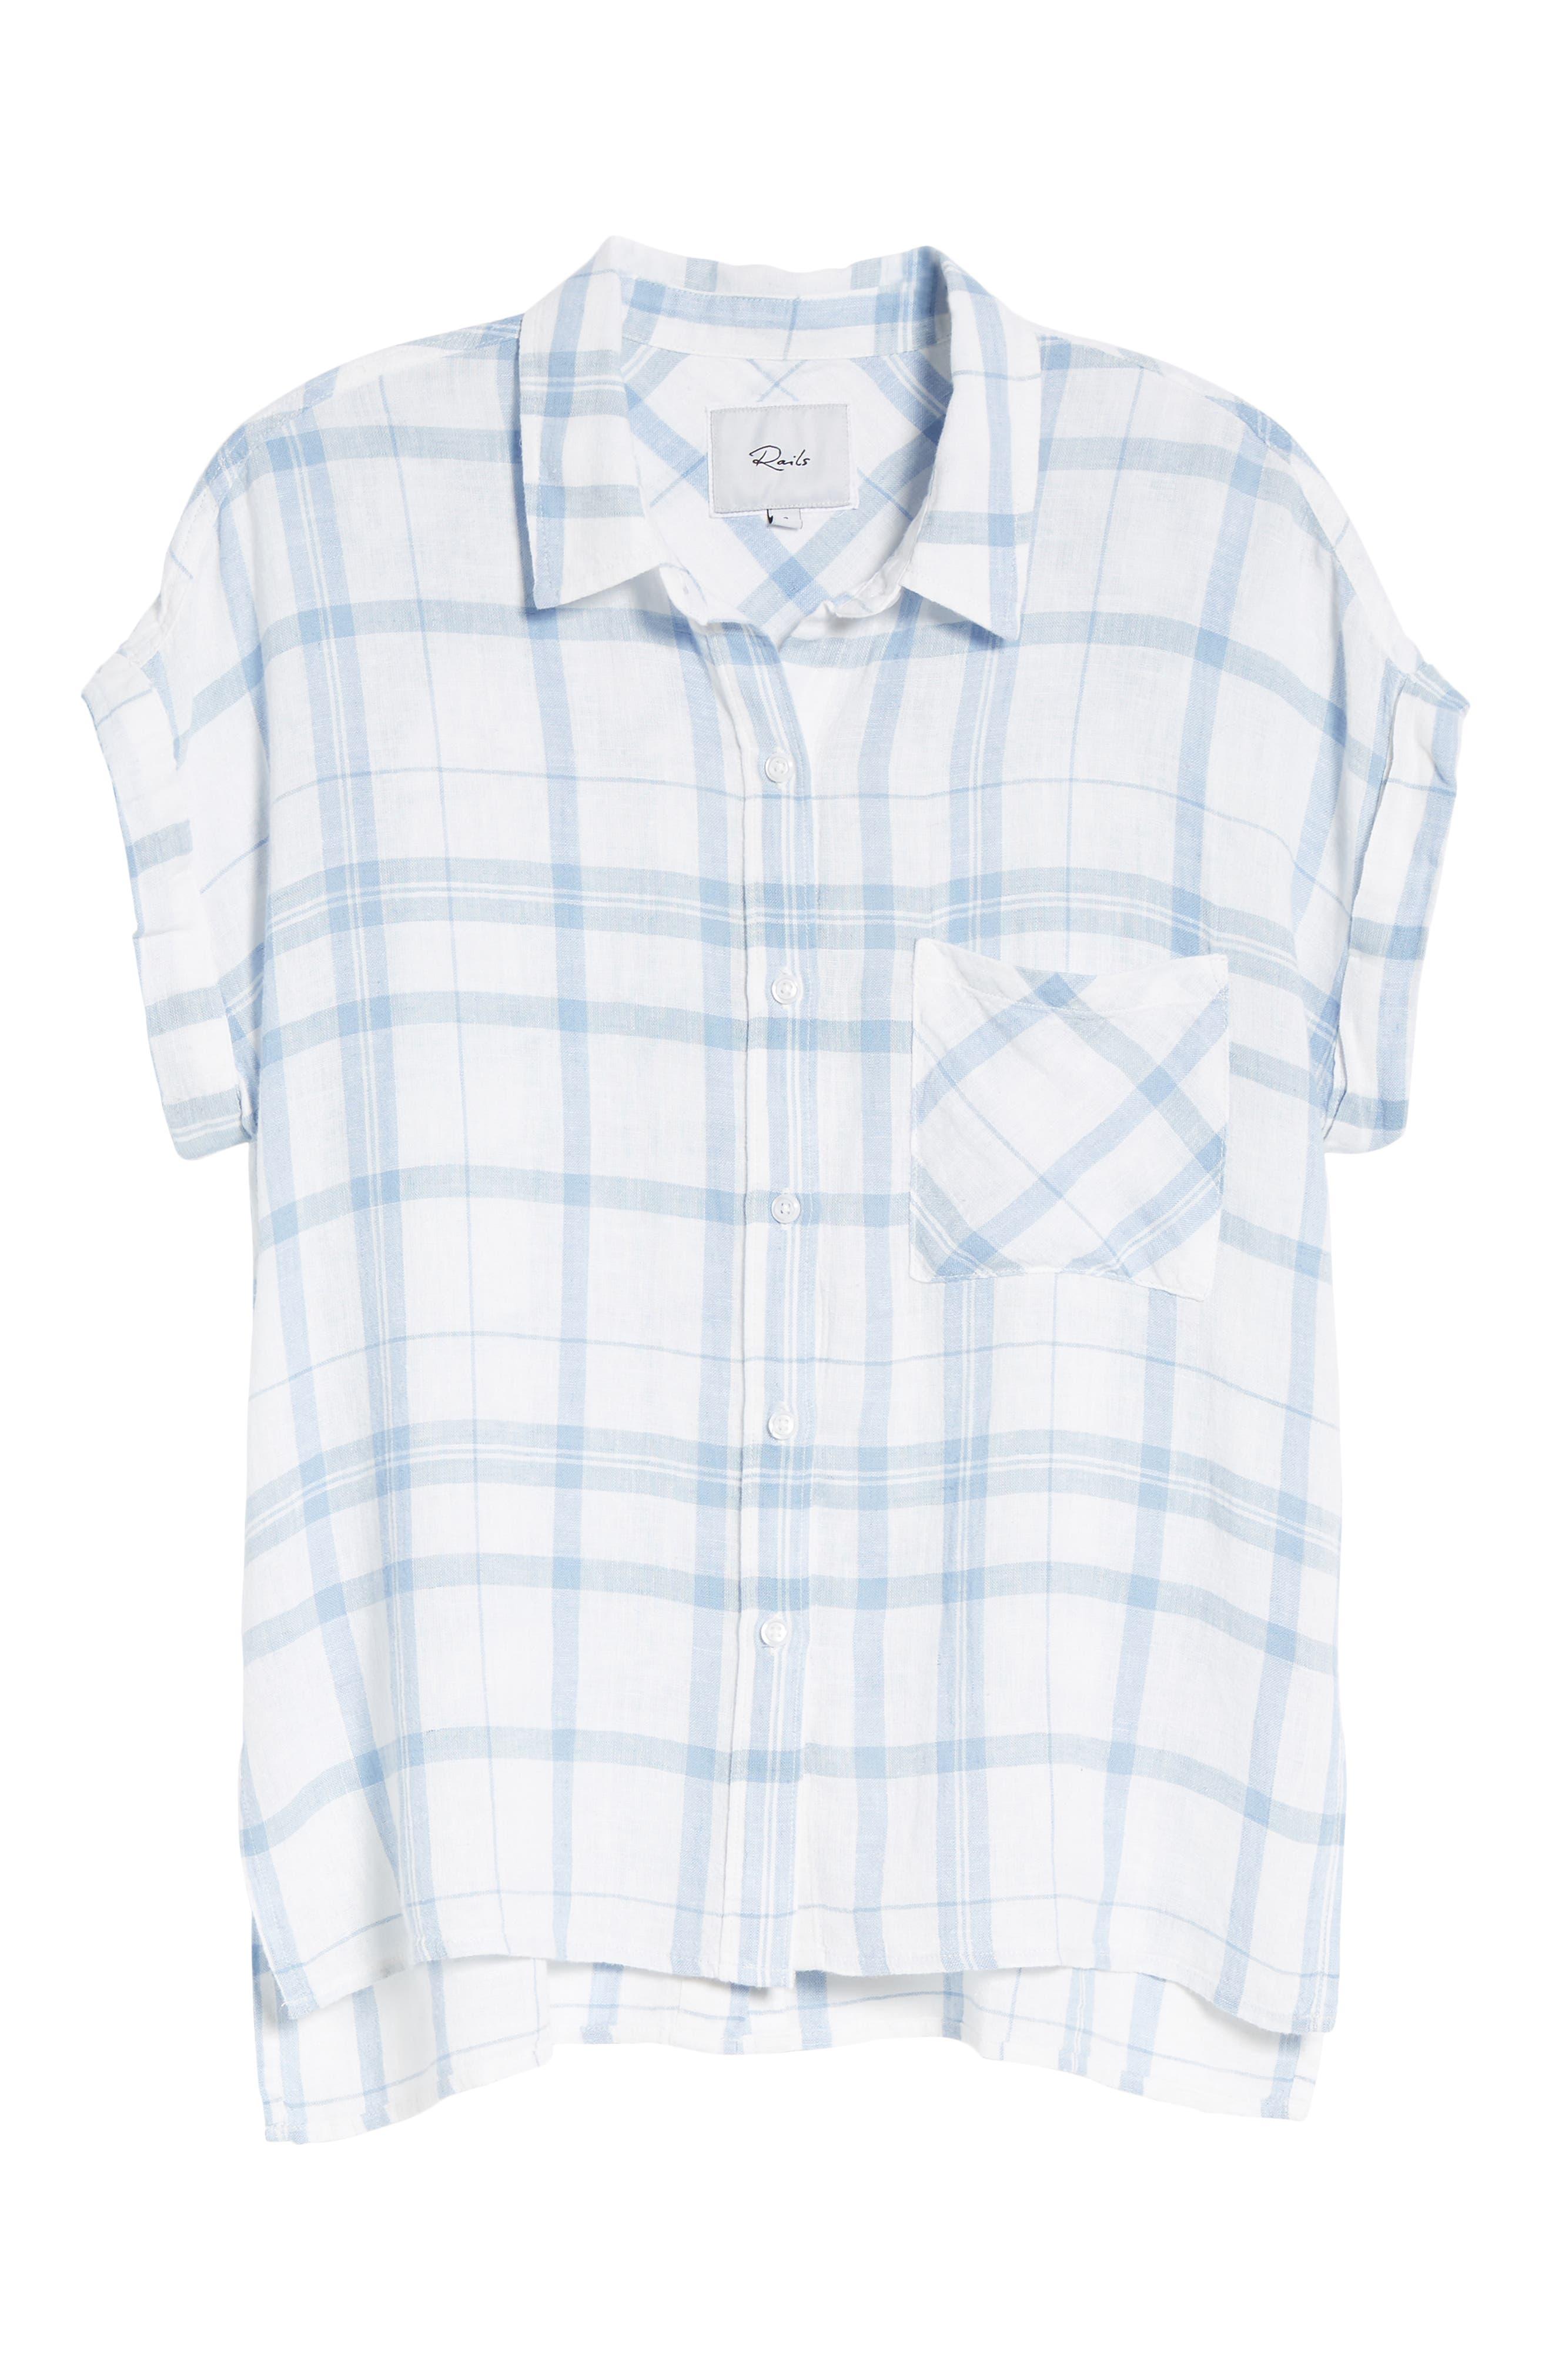 Mia Plaid Shirt,                             Alternate thumbnail 7, color,                             True Blue White